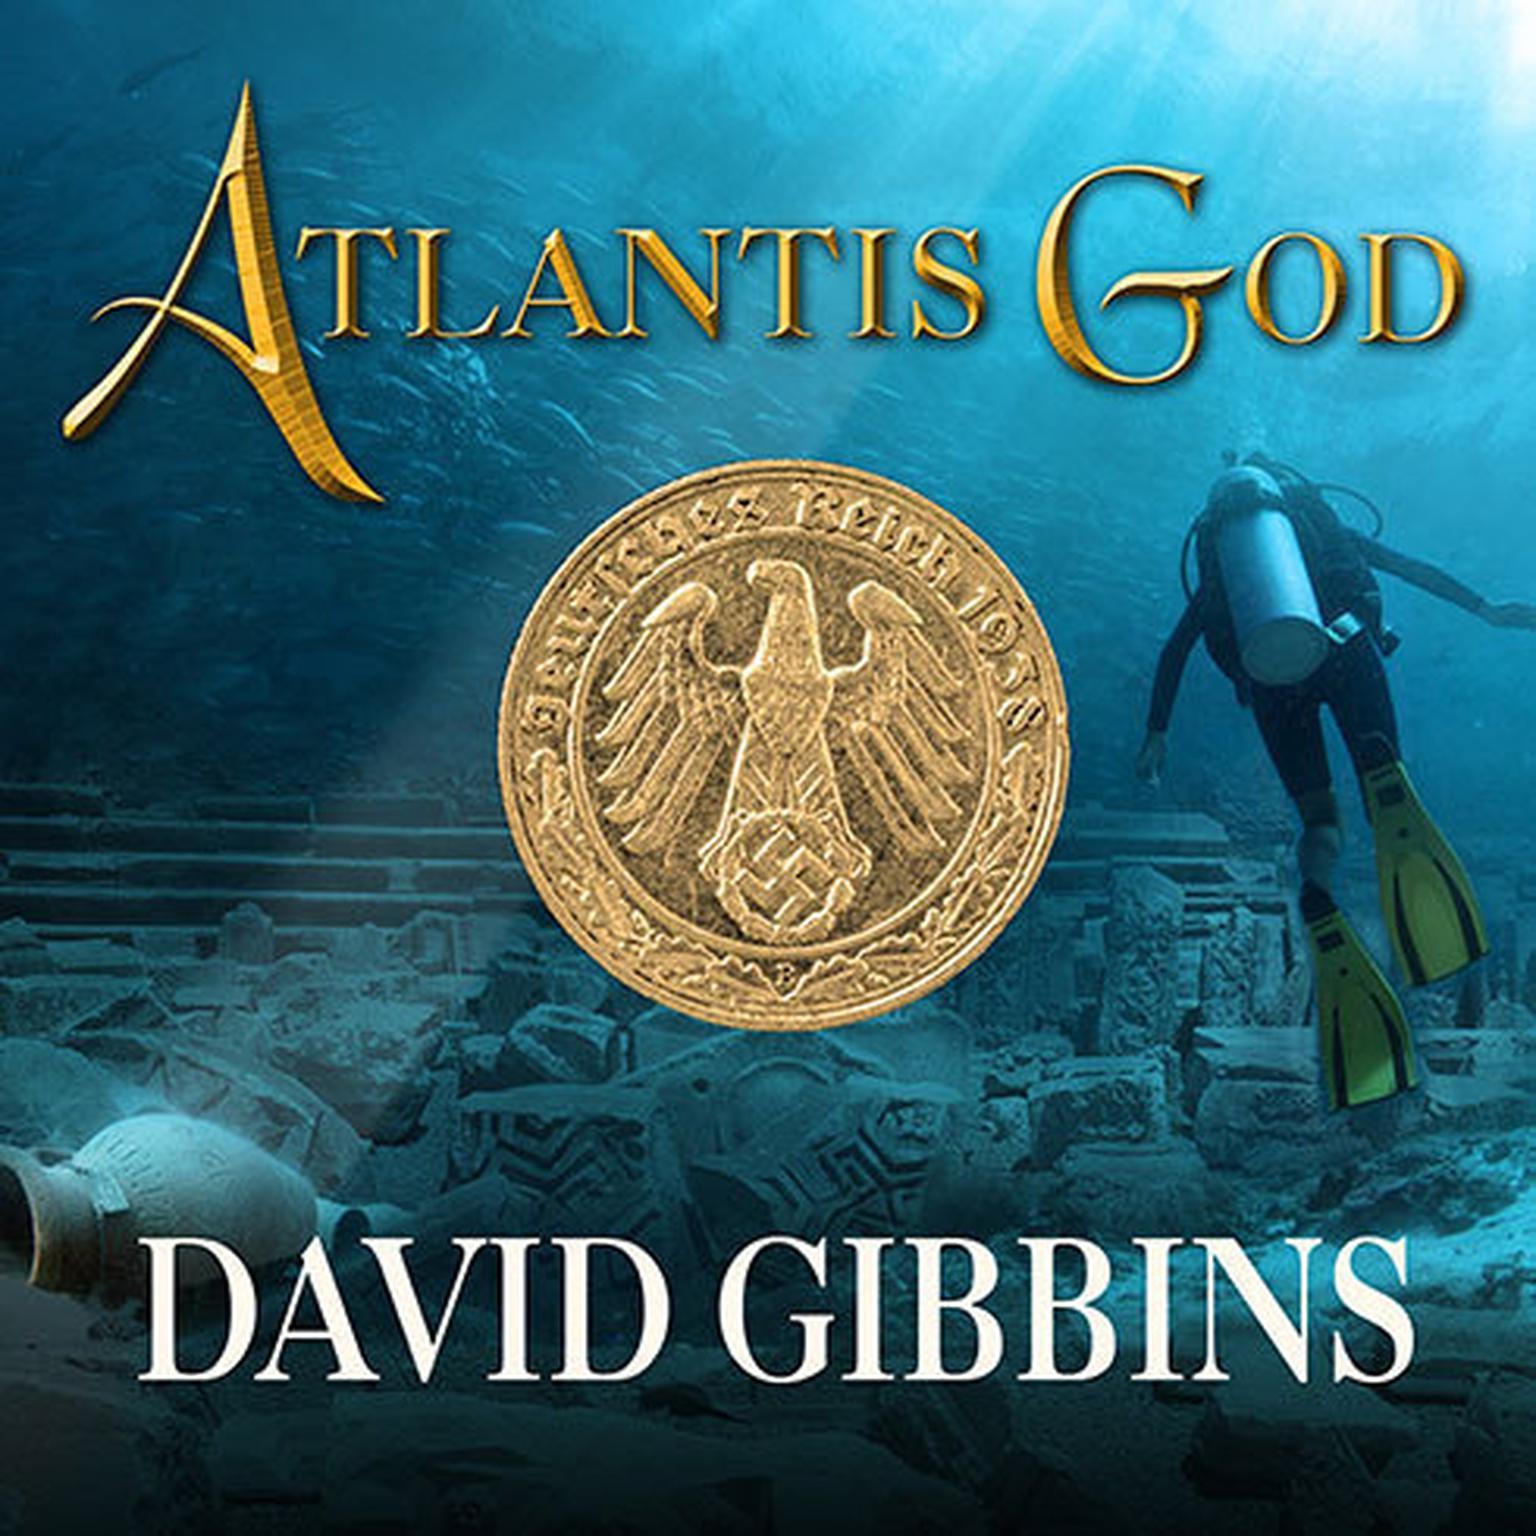 Atlantis God Audiobook, by David Gibbins